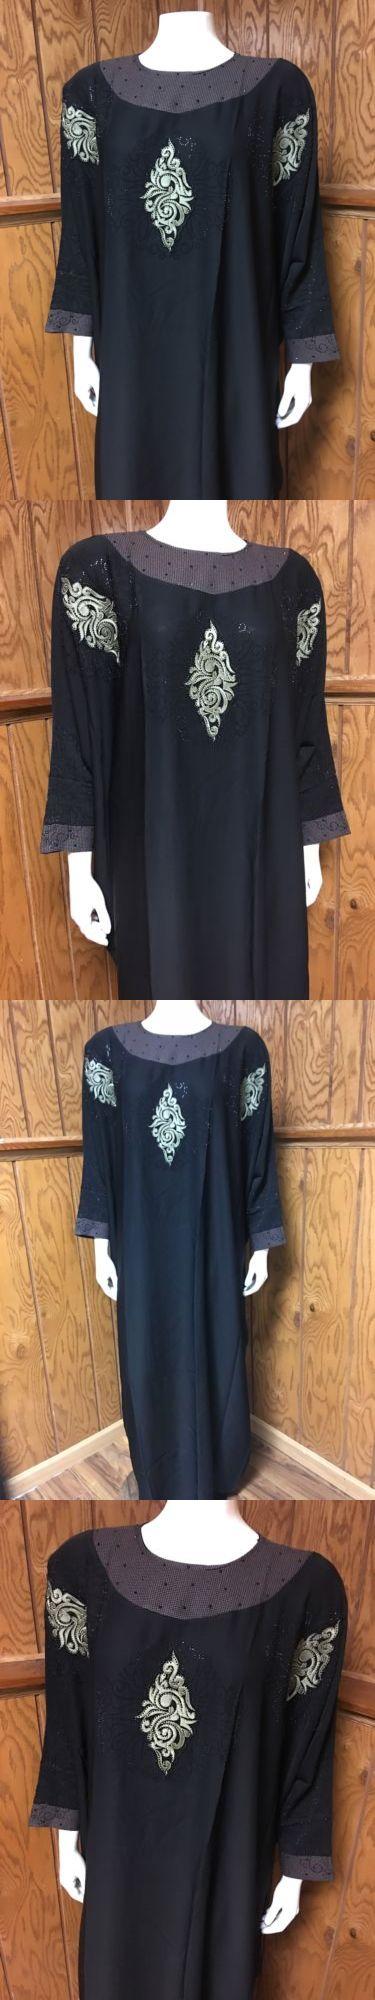 Middle East 155253: Butterfly Khaleeji Abaya Arabic Farasha Jilbab Umbrella Style Size L 58 -> BUY IT NOW ONLY: $44.99 on eBay!